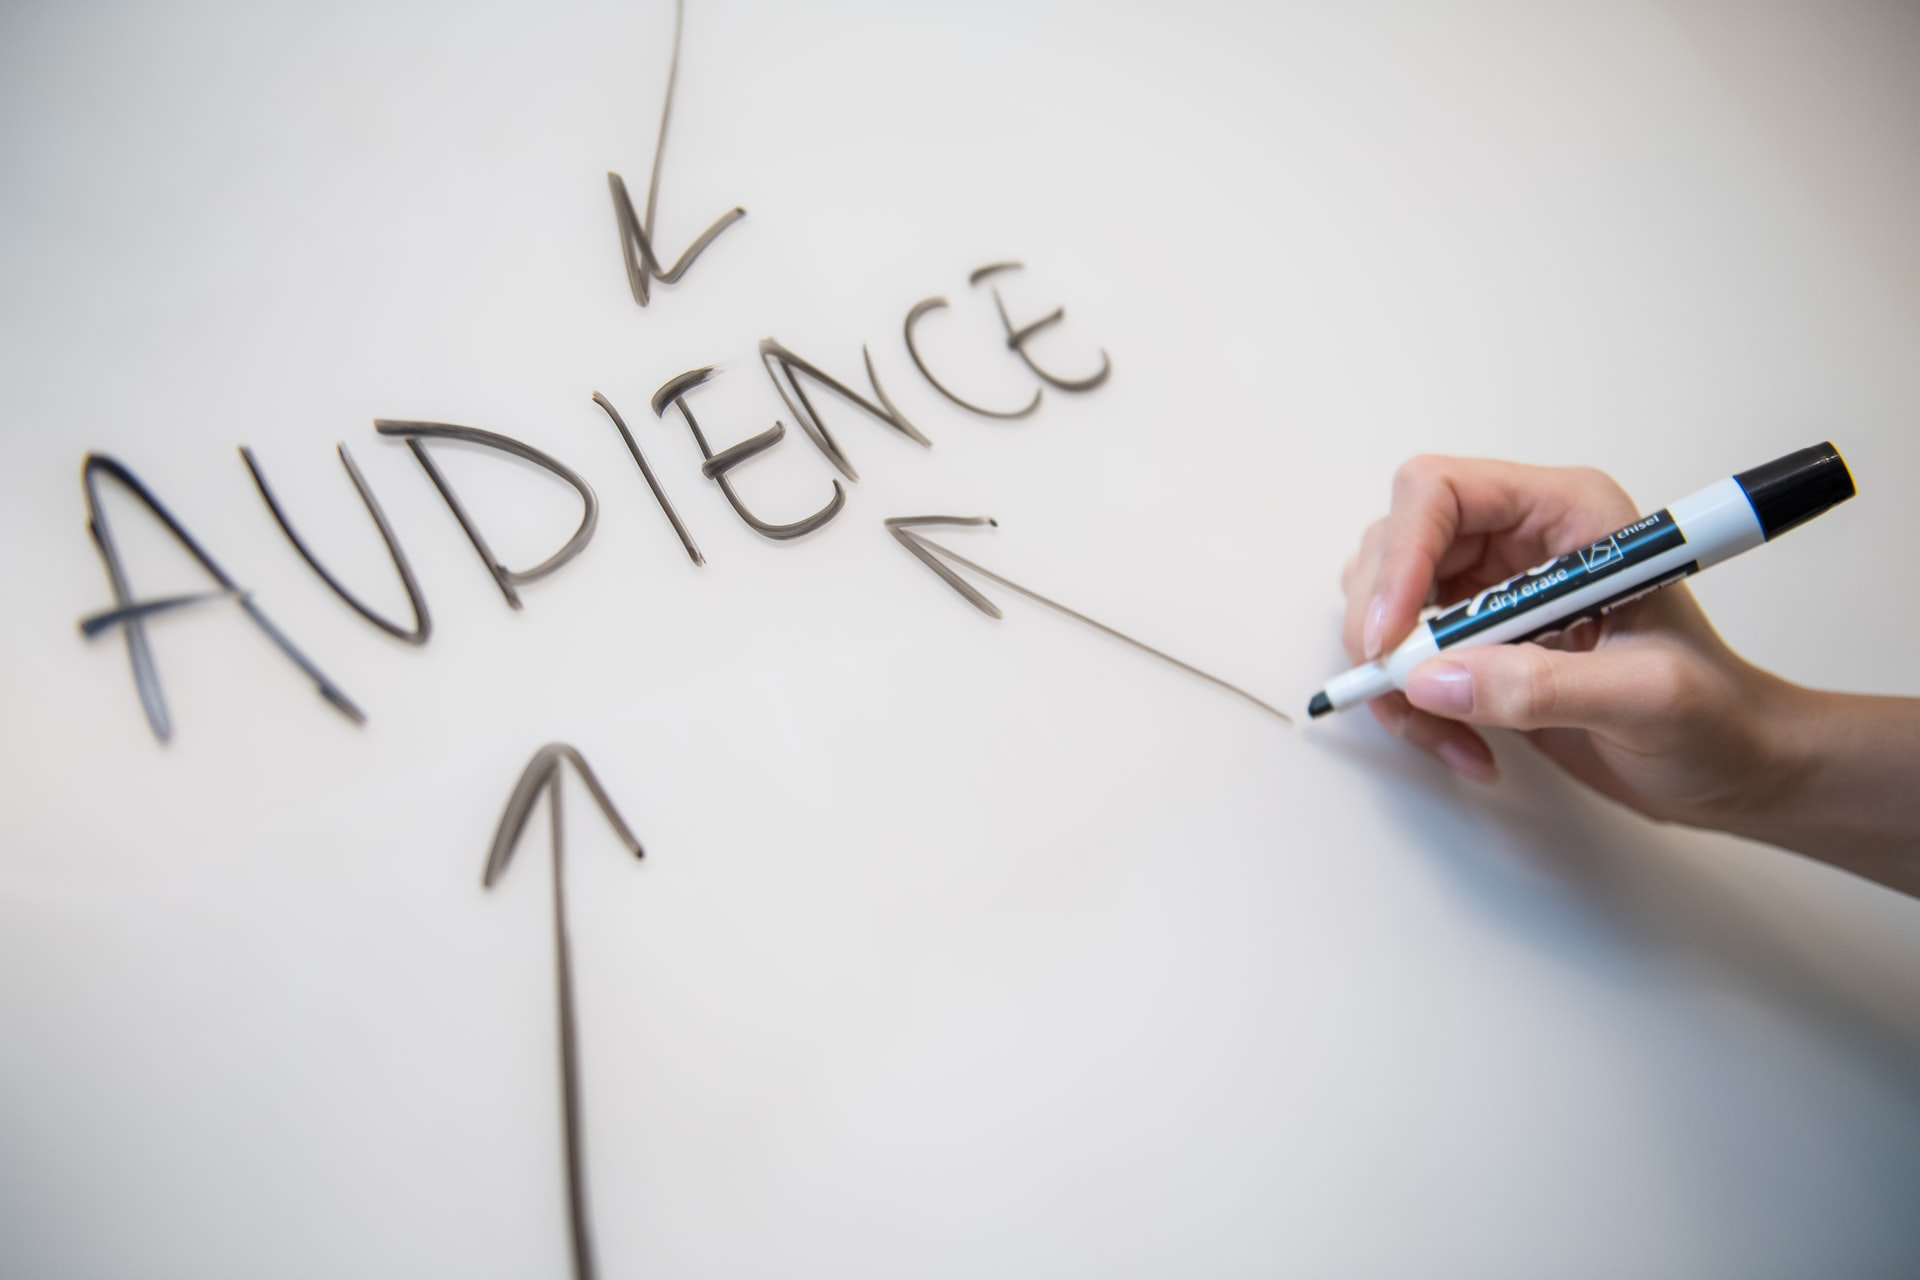 3 Basic Digital Marketing Frameworks to Guide Your Strategy